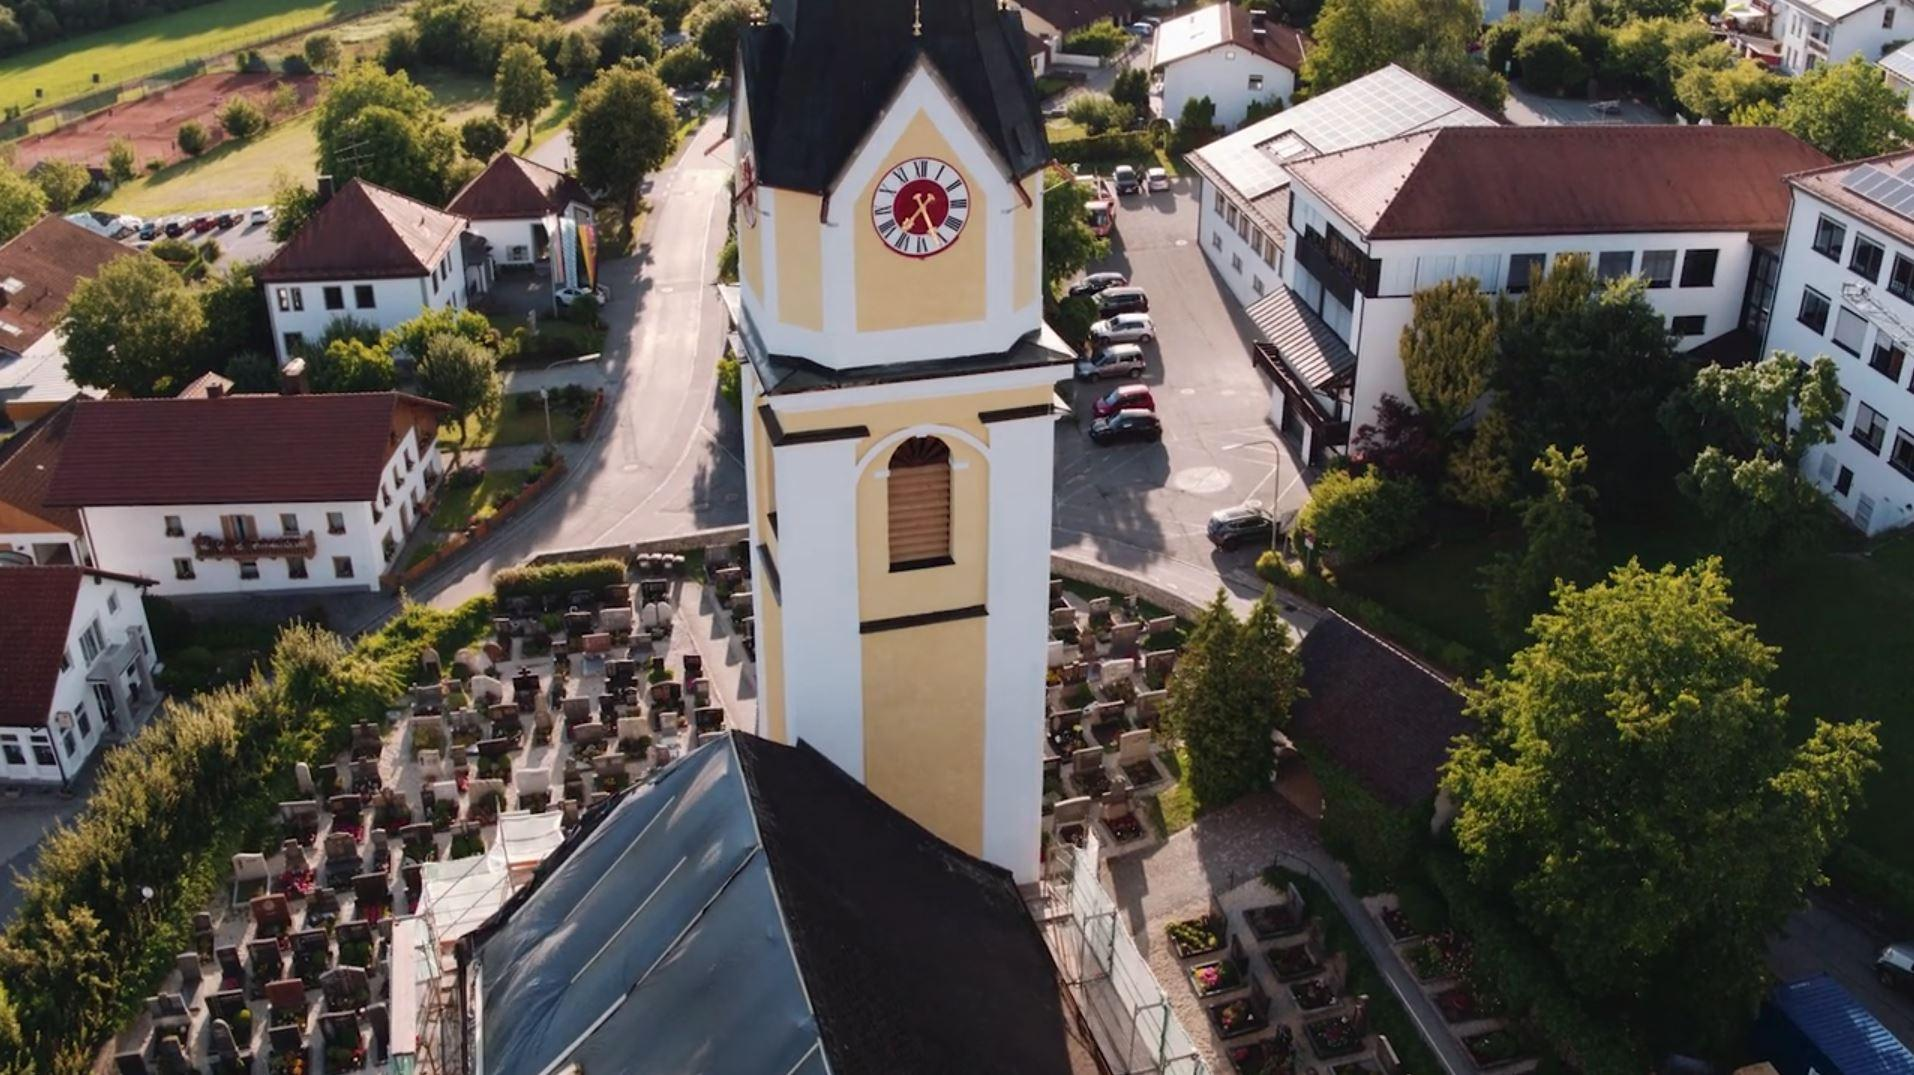 Pfarrkirche-Aicha_vorm_Wald_2